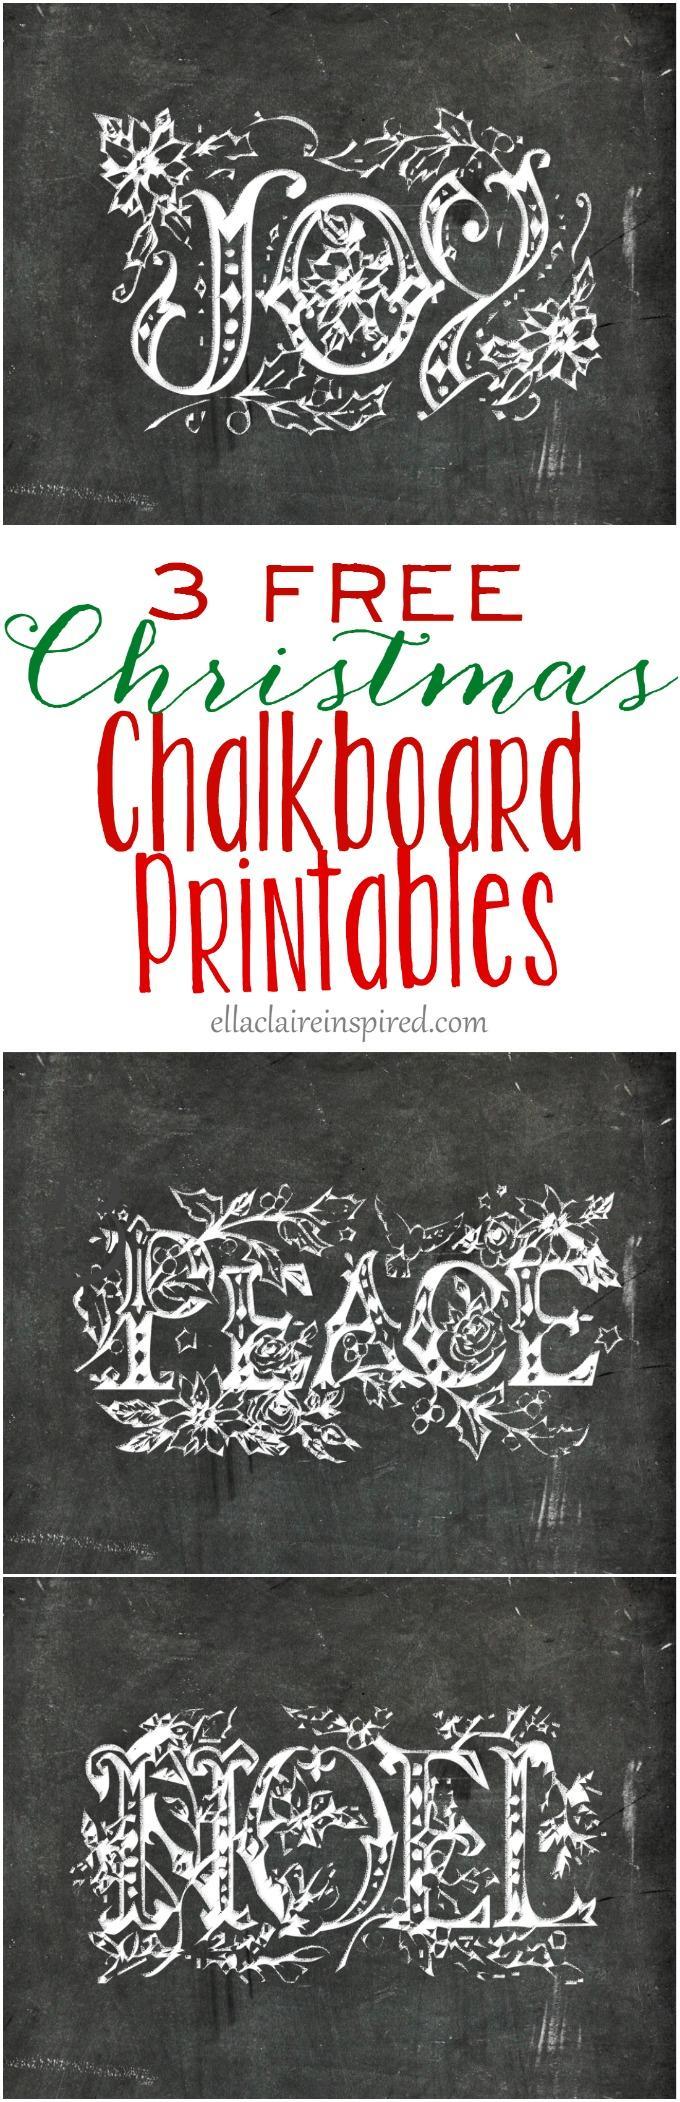 Chalkboard Printable Template